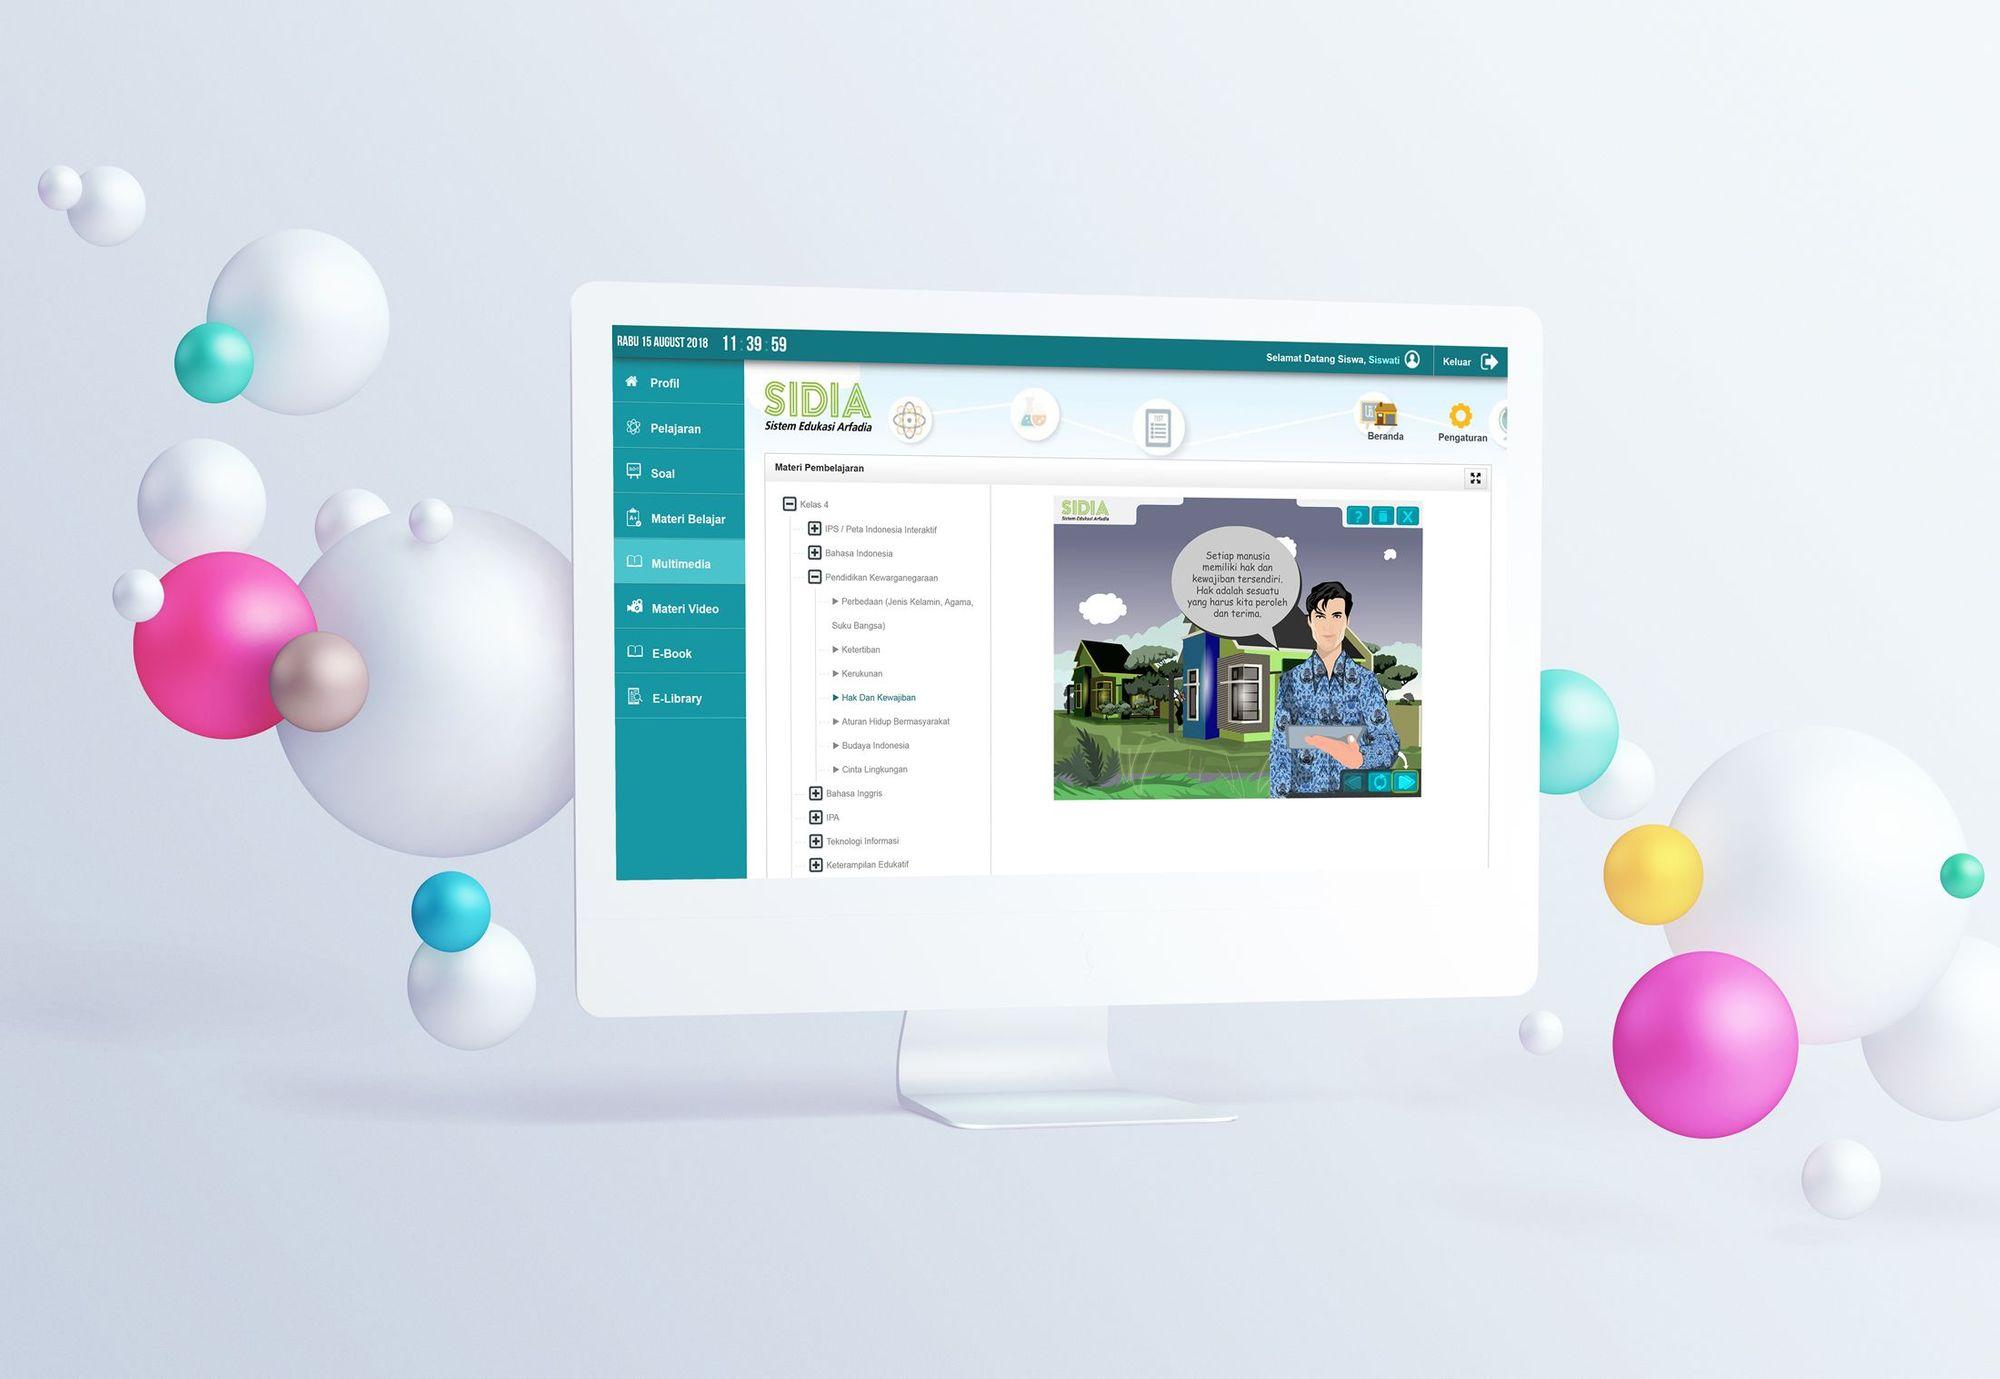 Pentingnya Sarana dalam Pendidikan dengan Pengadaan Paket Laboratorium Komputer Media Pembelajaran untuk Sekolah